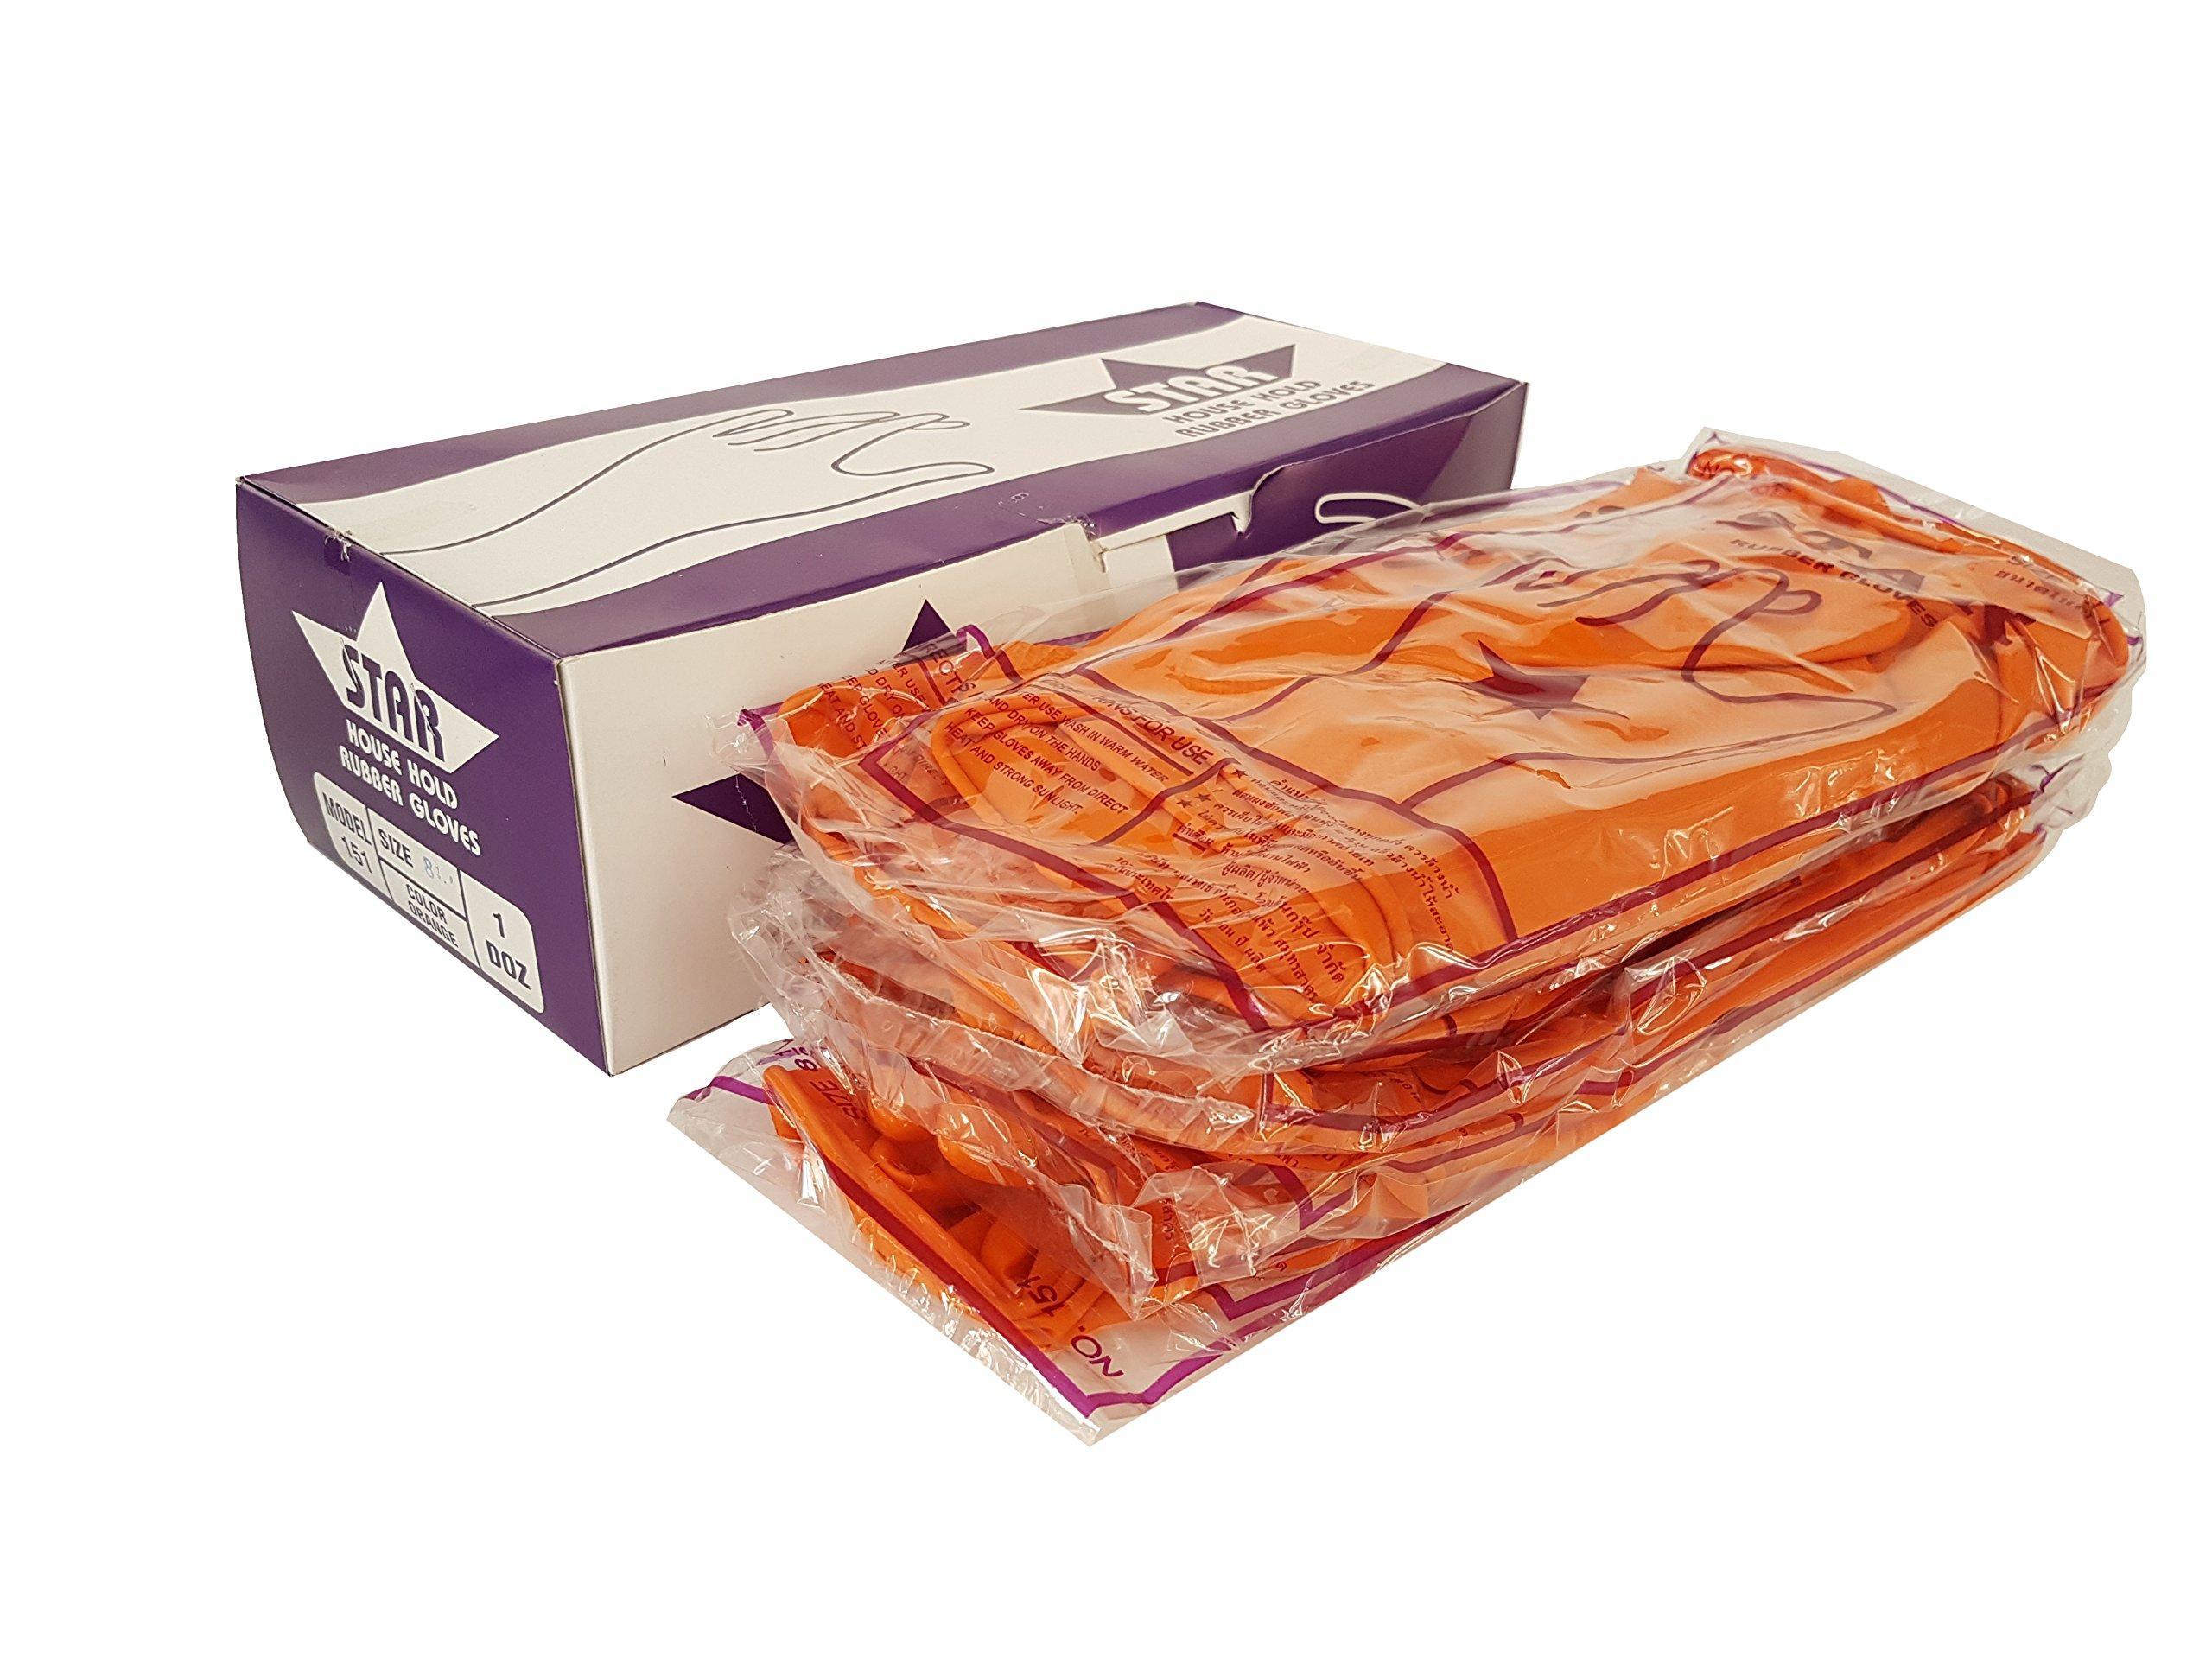 Prasertsteel Orange Rubber Gloves 12 Pack